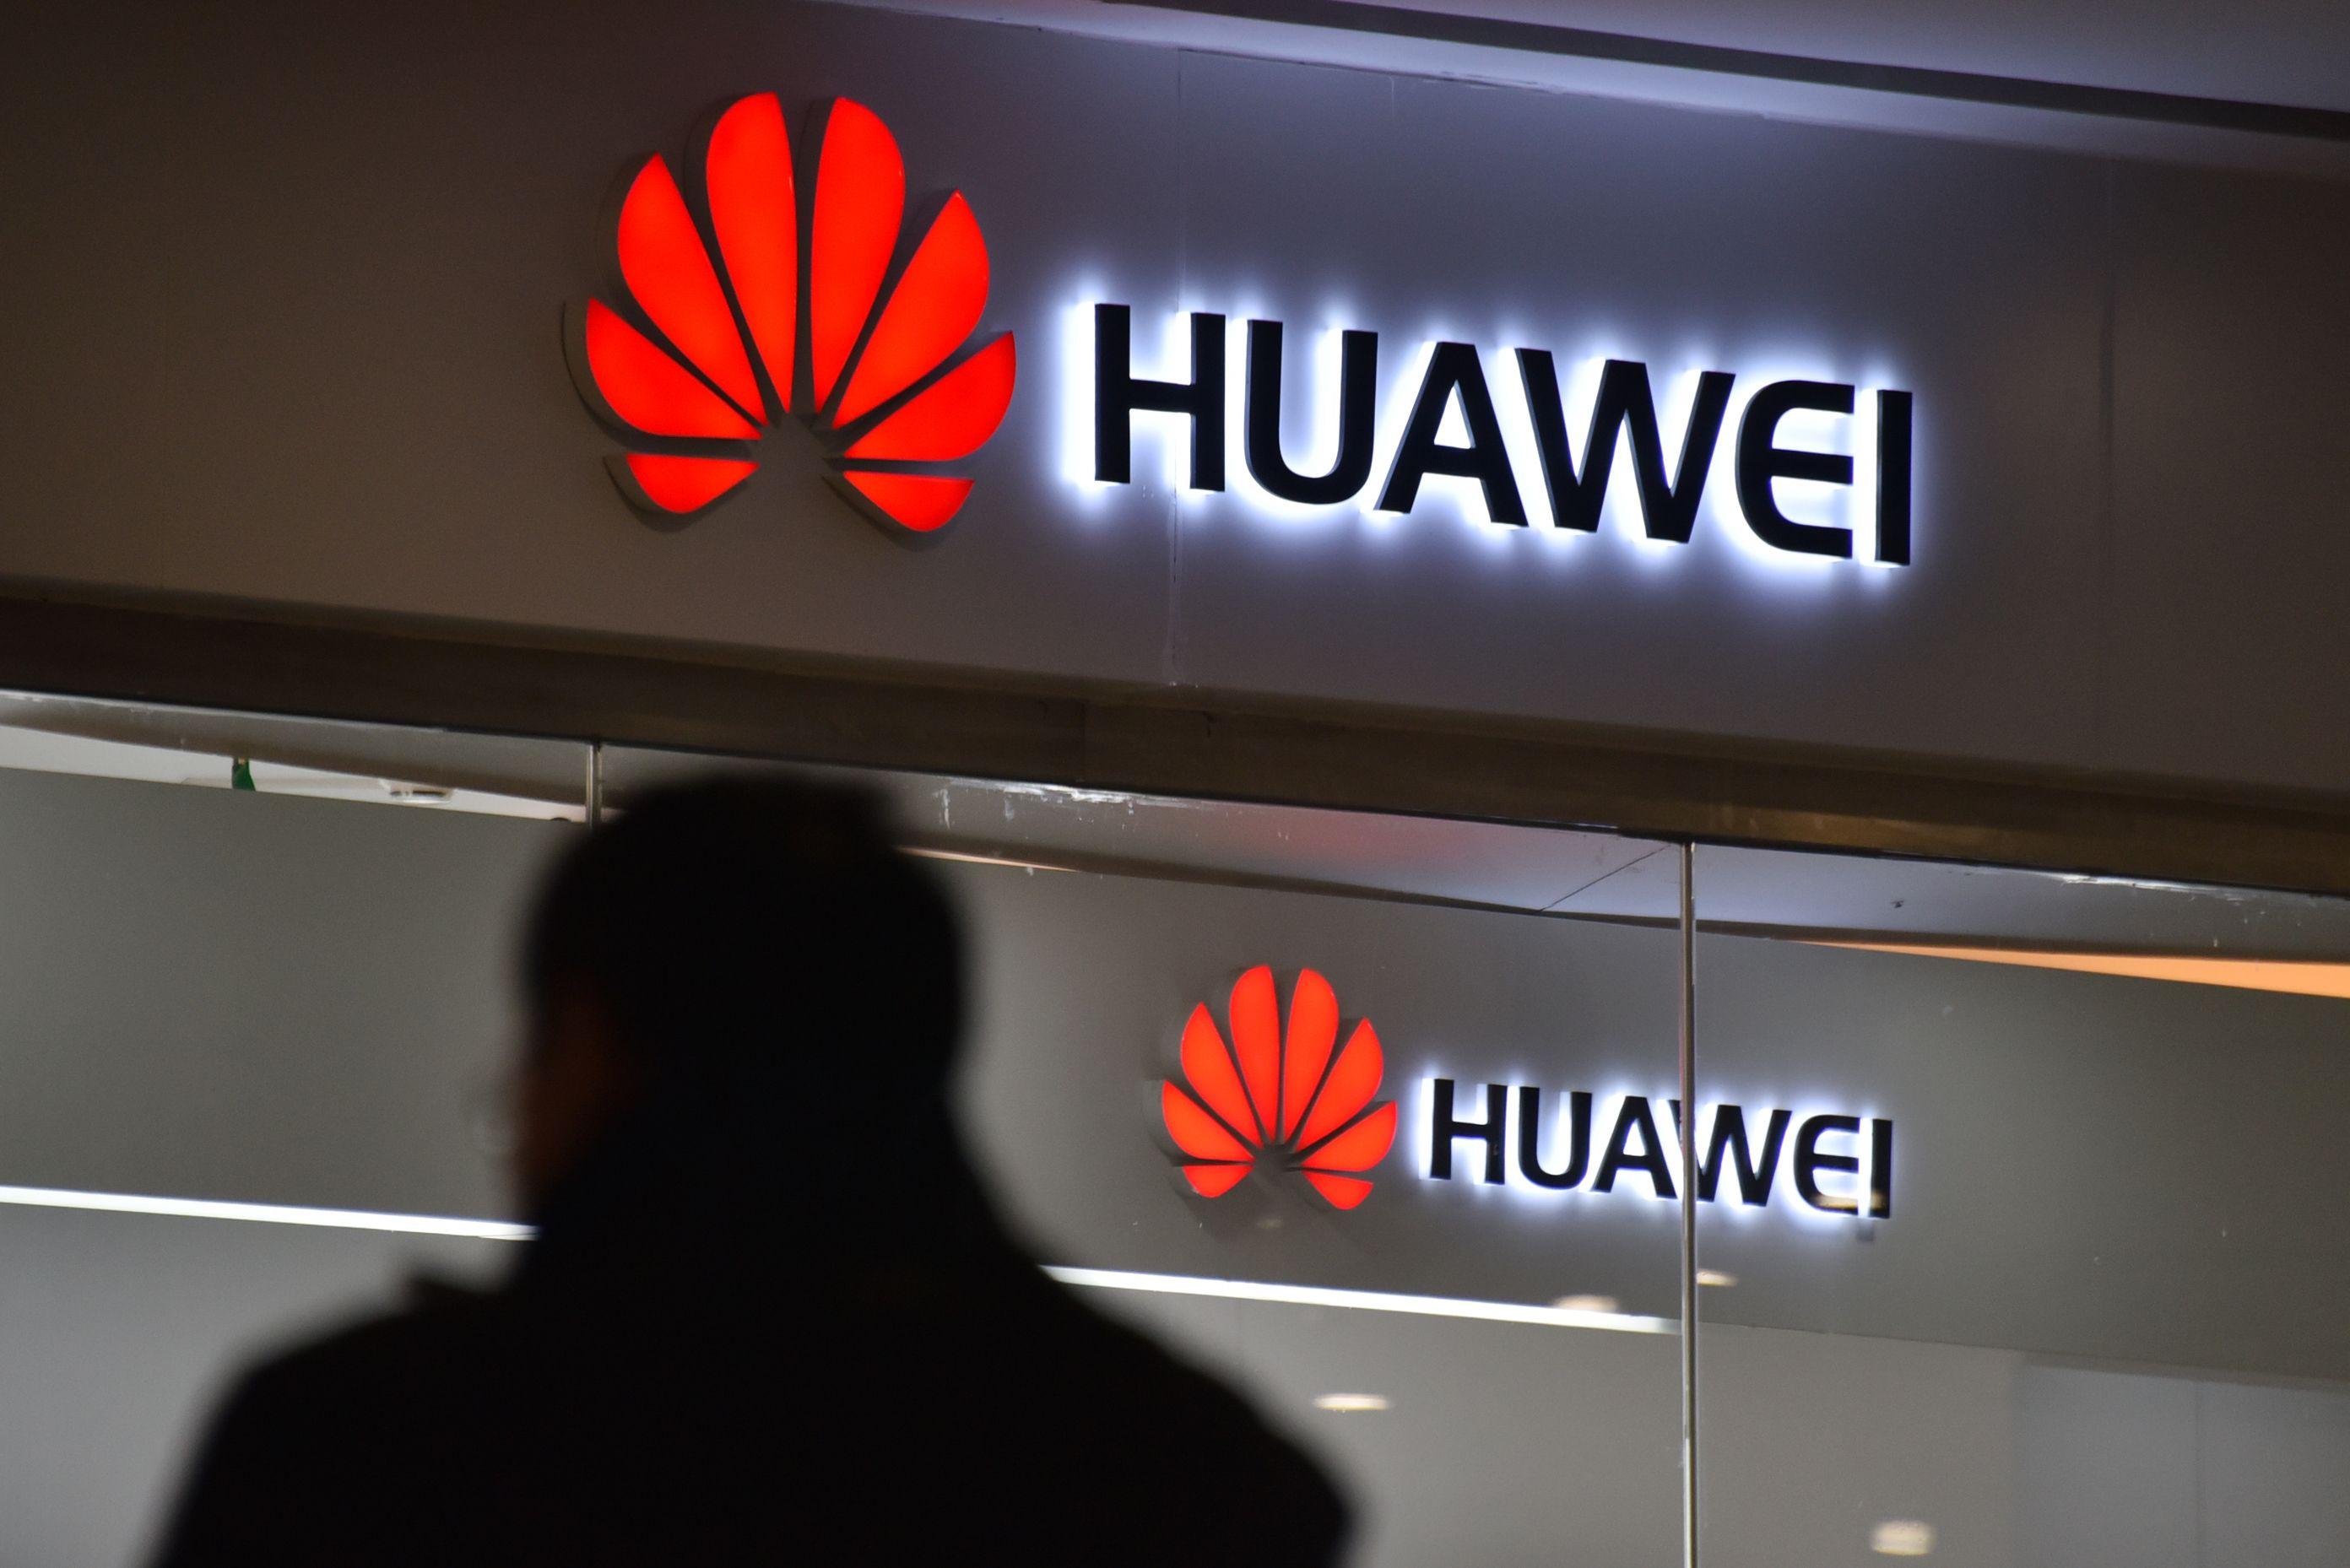 bloomberg.com - Pankaj Mishra - Attacking Huawei Will Backfire